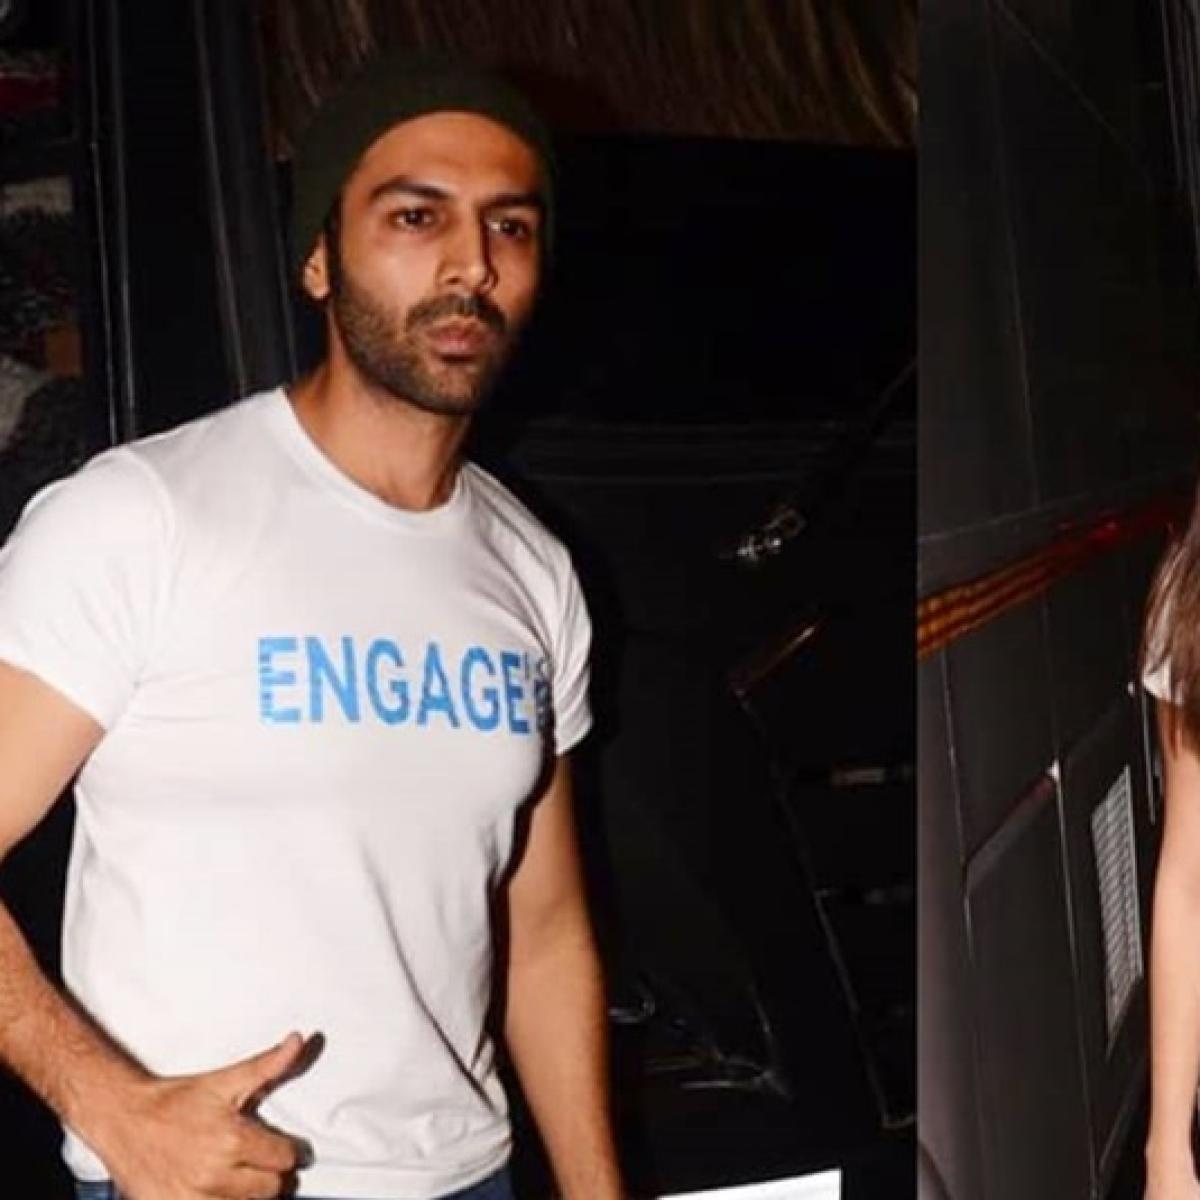 Kartik Aaryan engaged to Tara Sutaria? Netizens call for Sara Ali Khan